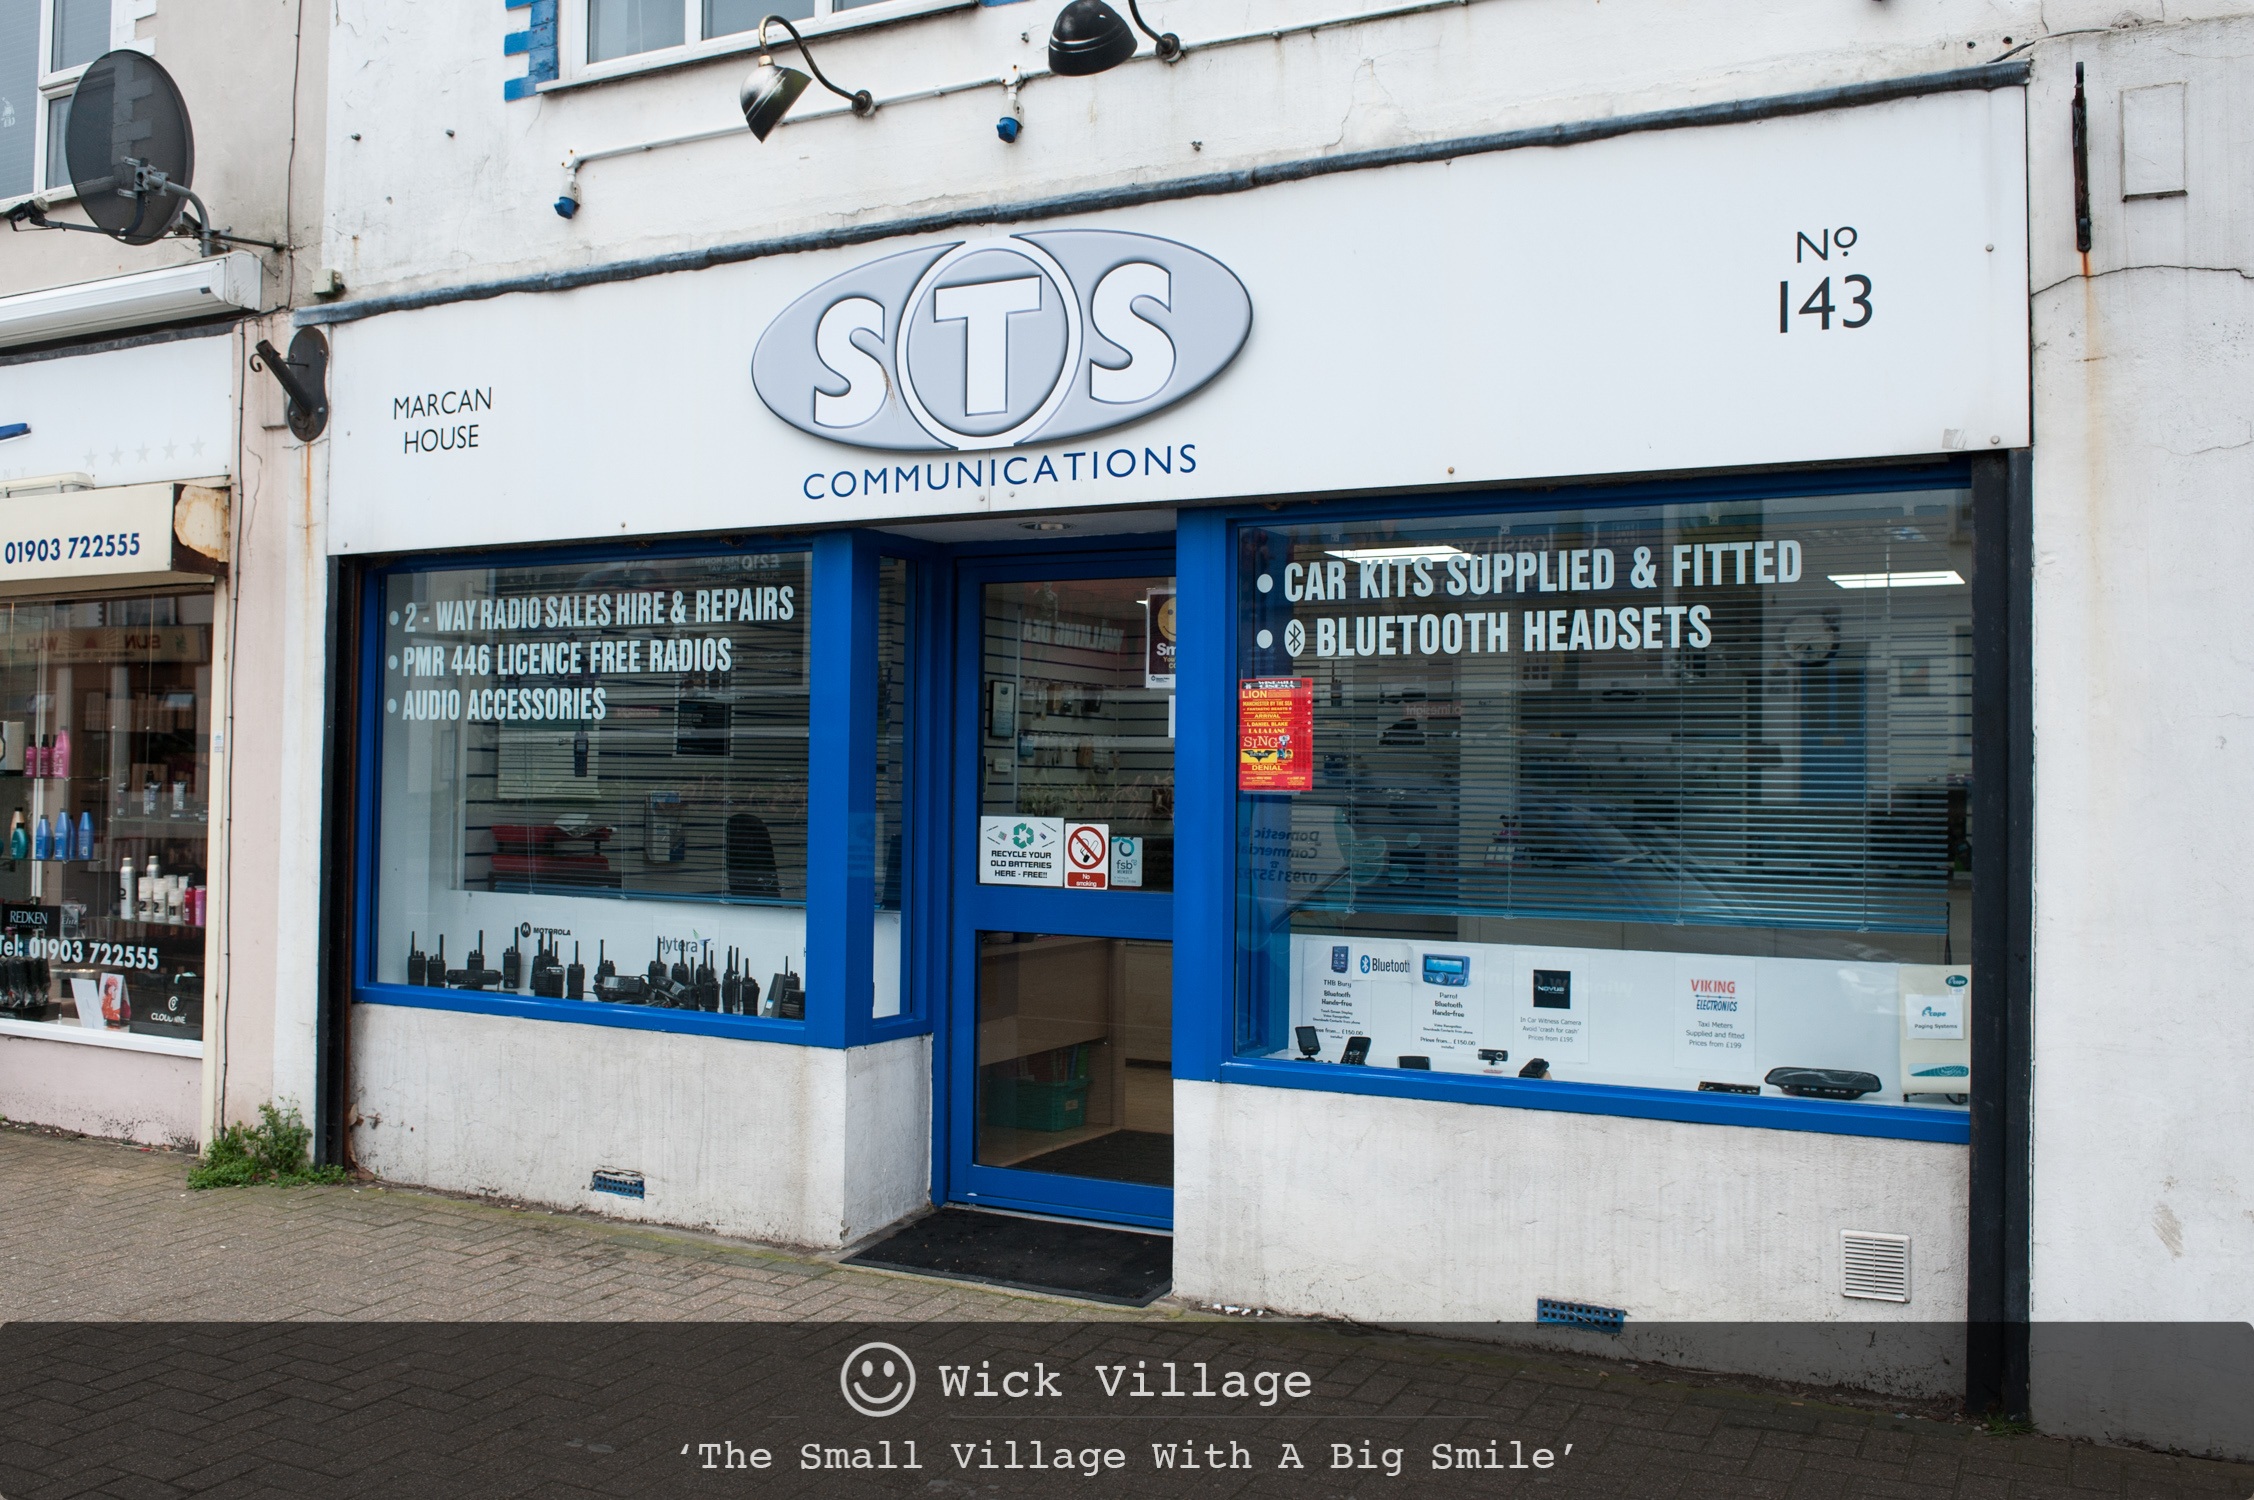 S.T.S Communications, Wick Village, Littlehampton.